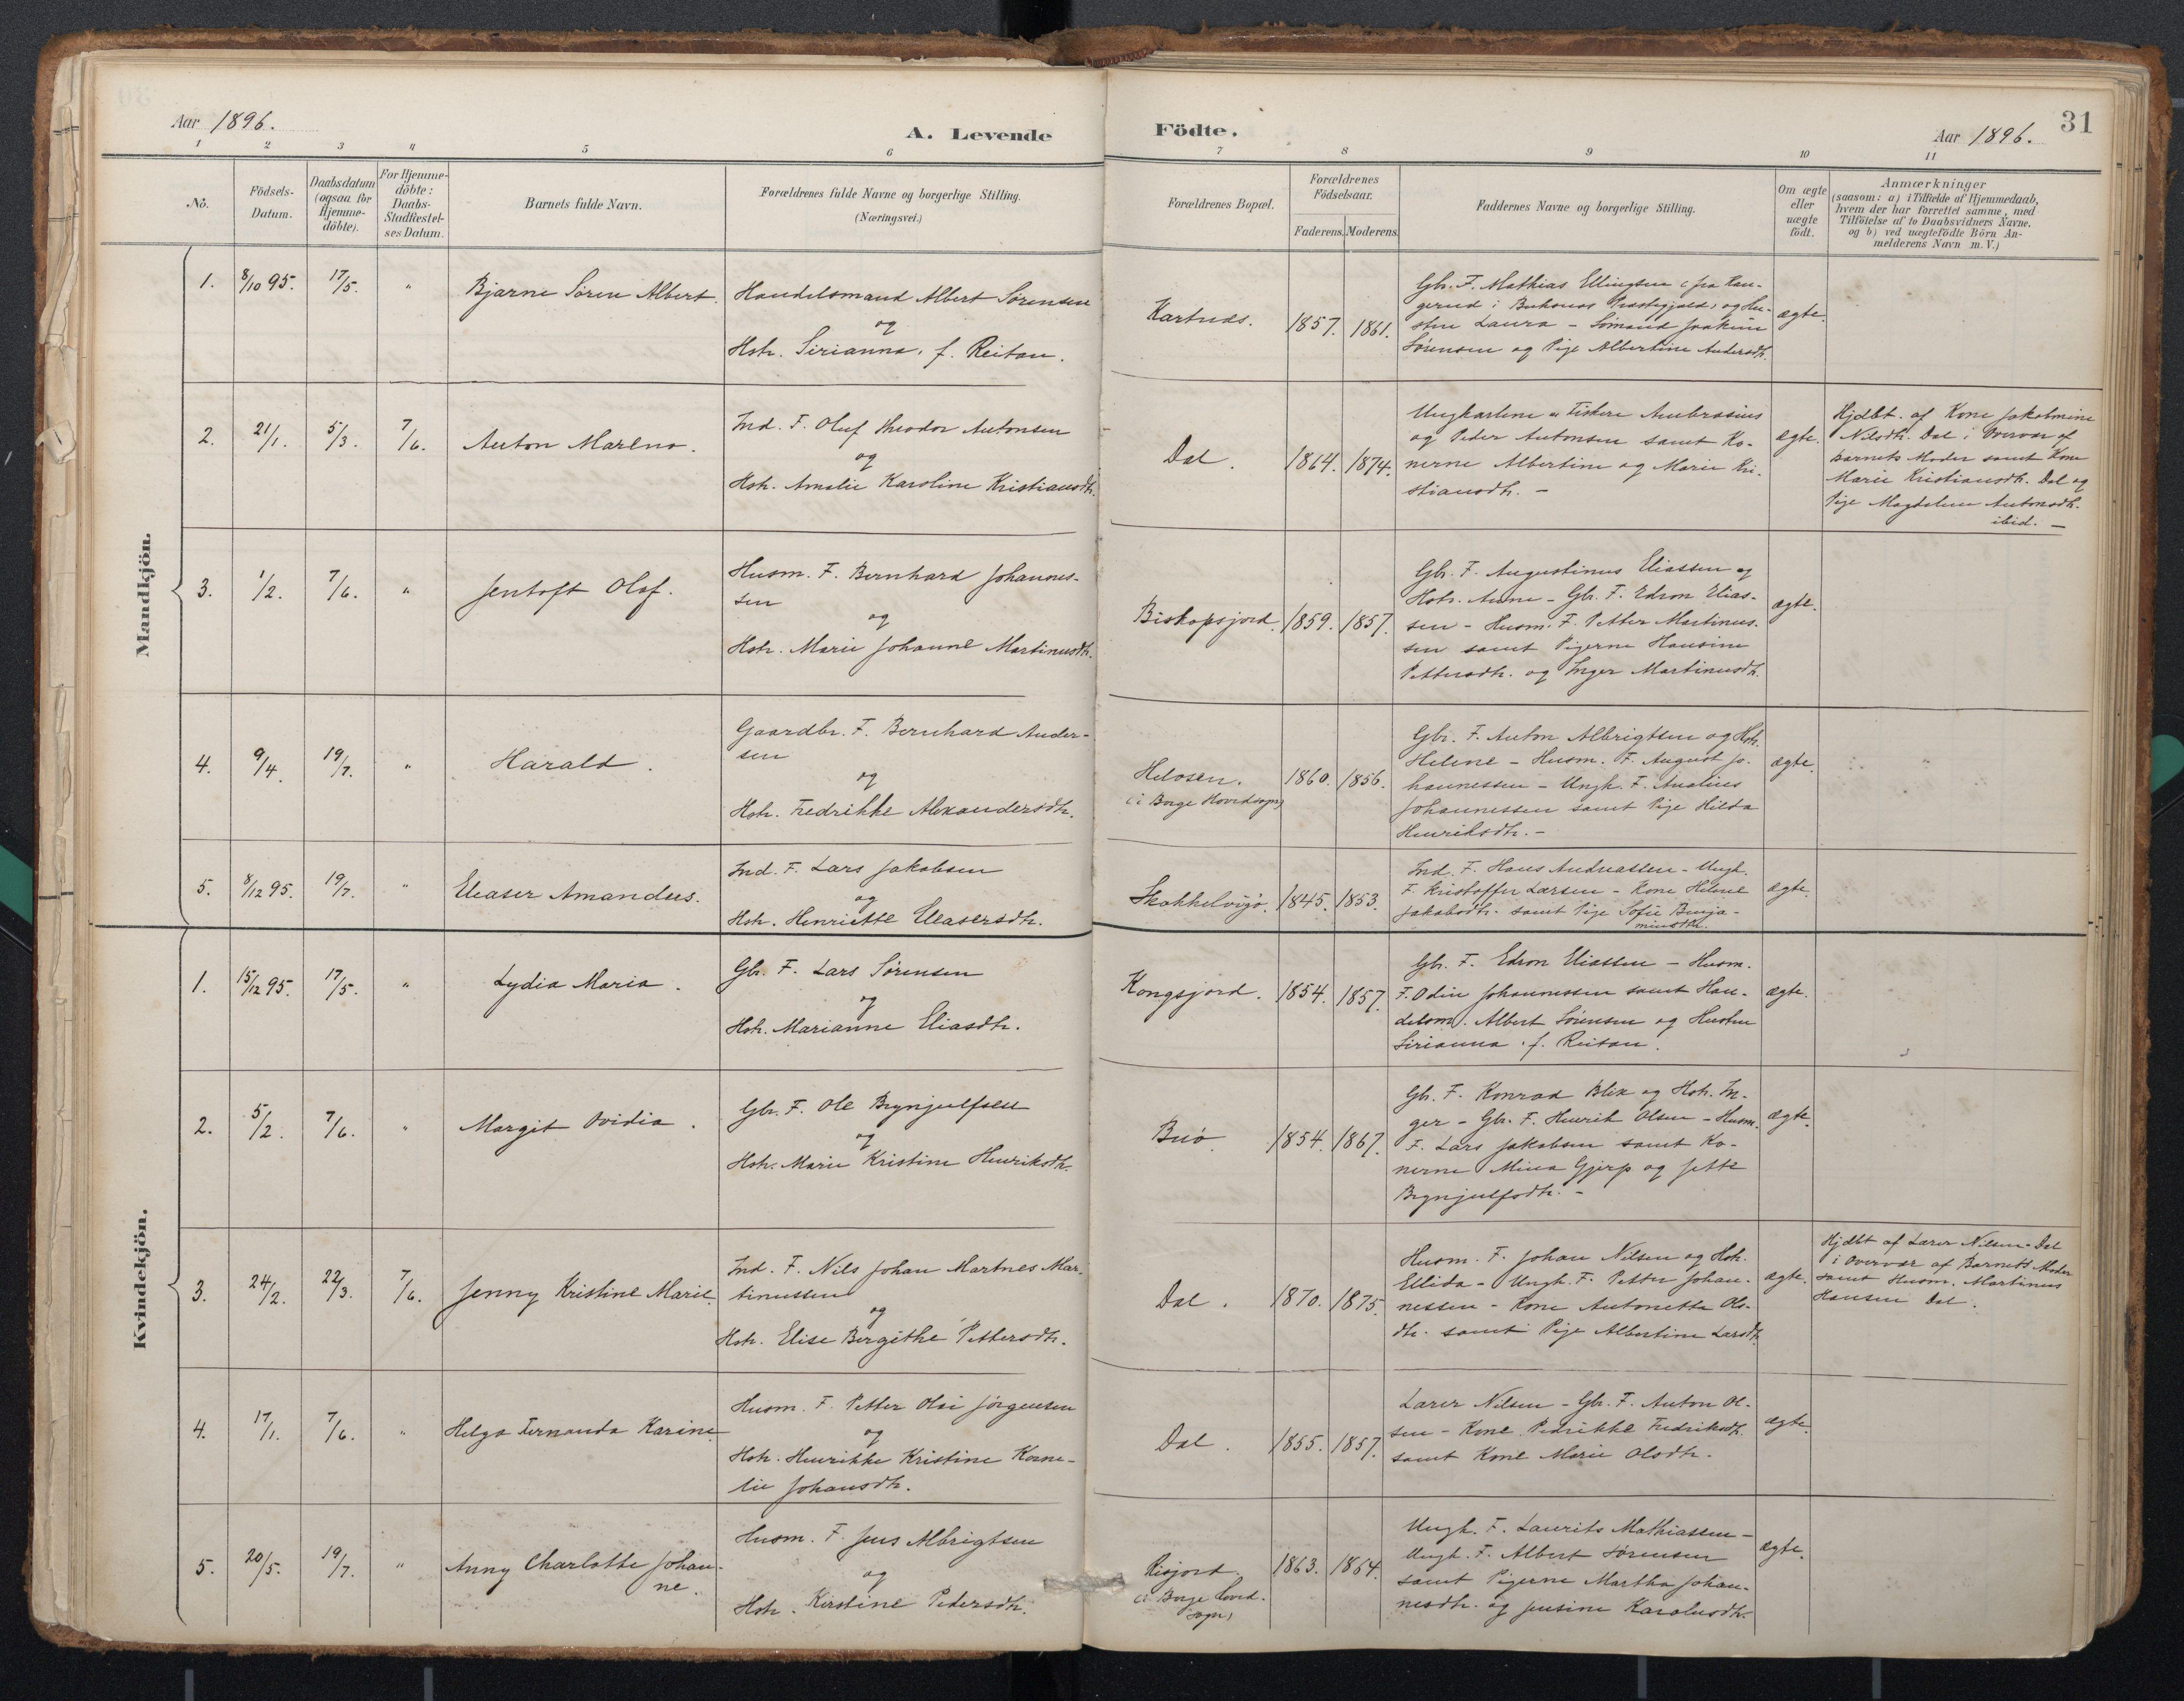 SAT, Ministerialprotokoller, klokkerbøker og fødselsregistre - Nordland, 884/L1193: Ministerialbok nr. 884A01, 1888-1905, s. 31